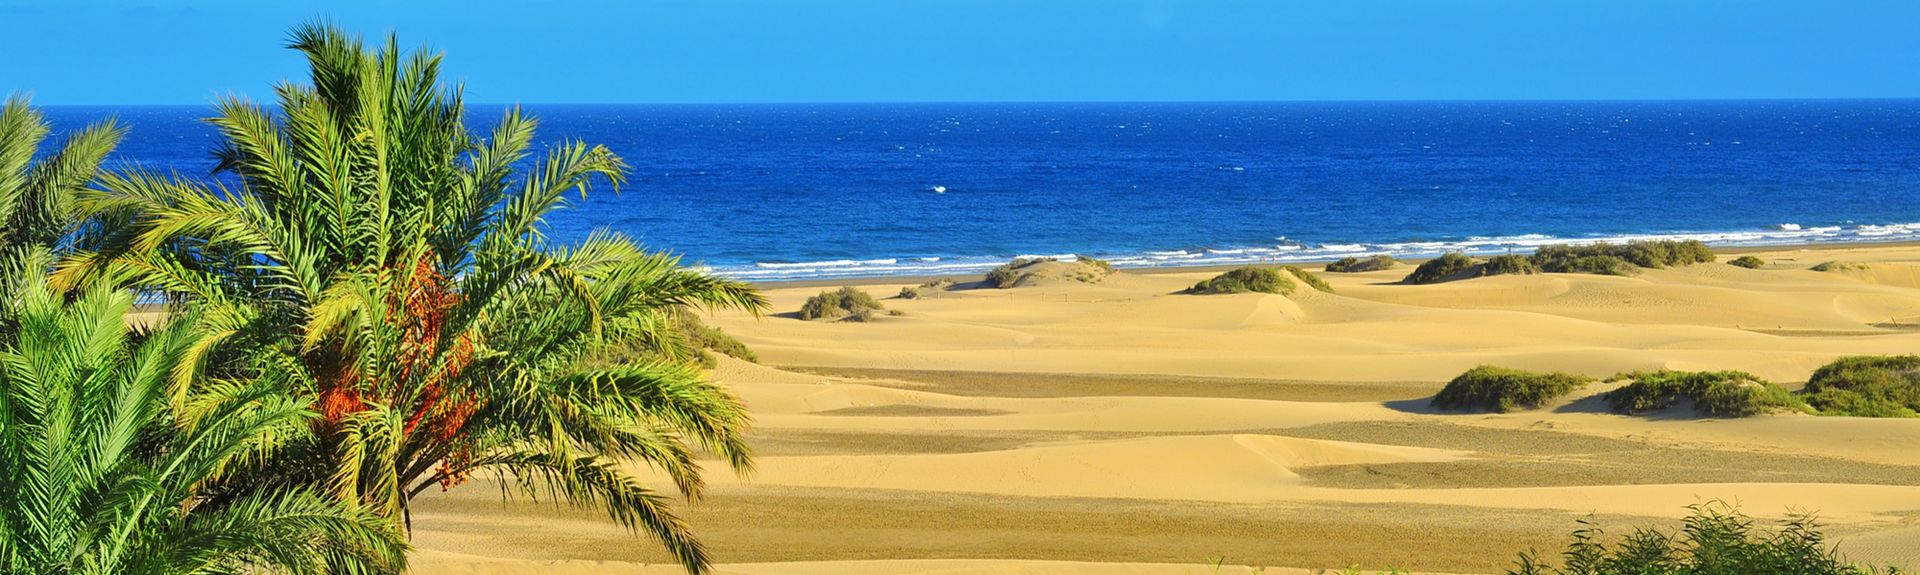 Playa de Puerto Rico, Mogan, Kanarieöarna, Spanien